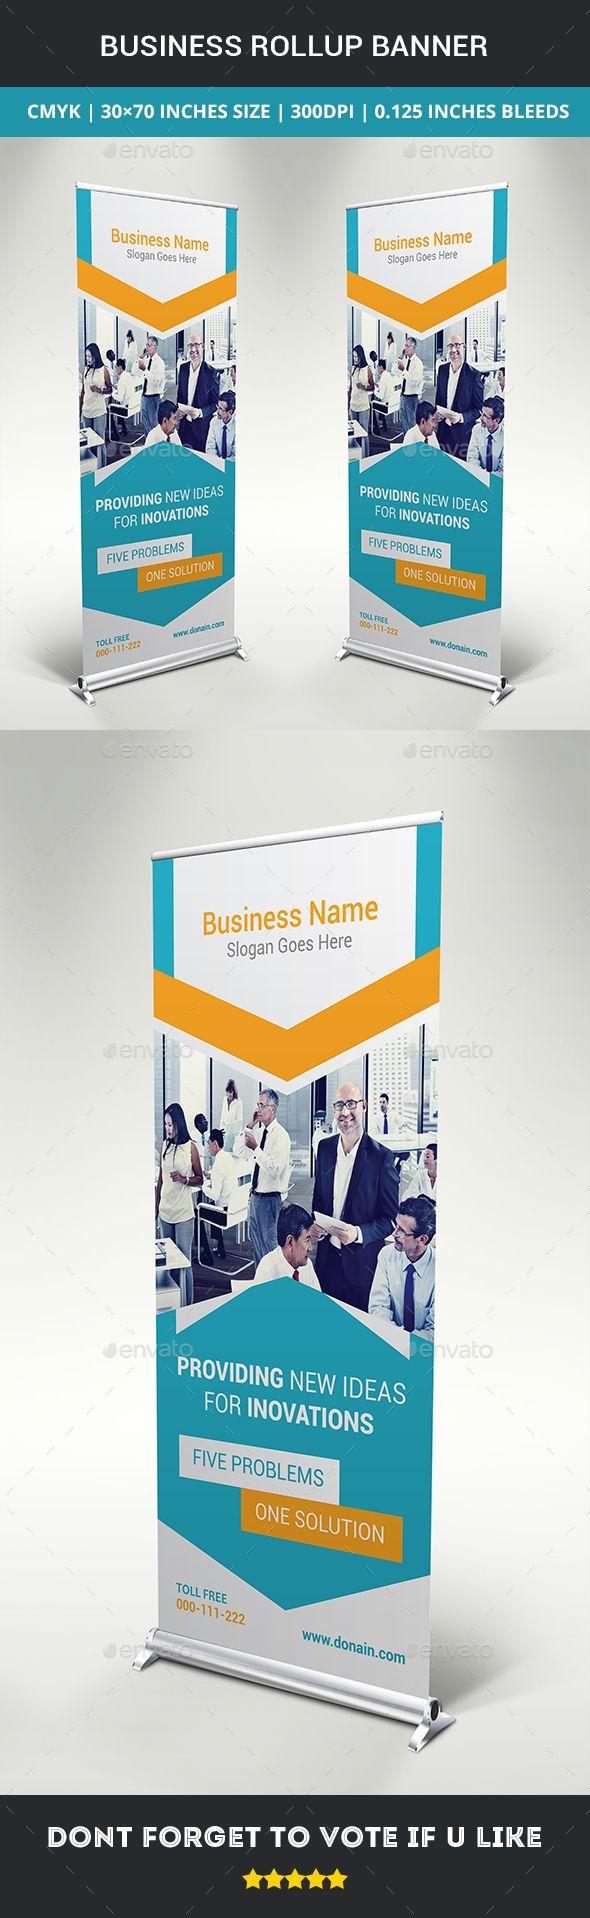 Design large banner in illustrator - Business Rollup Banner